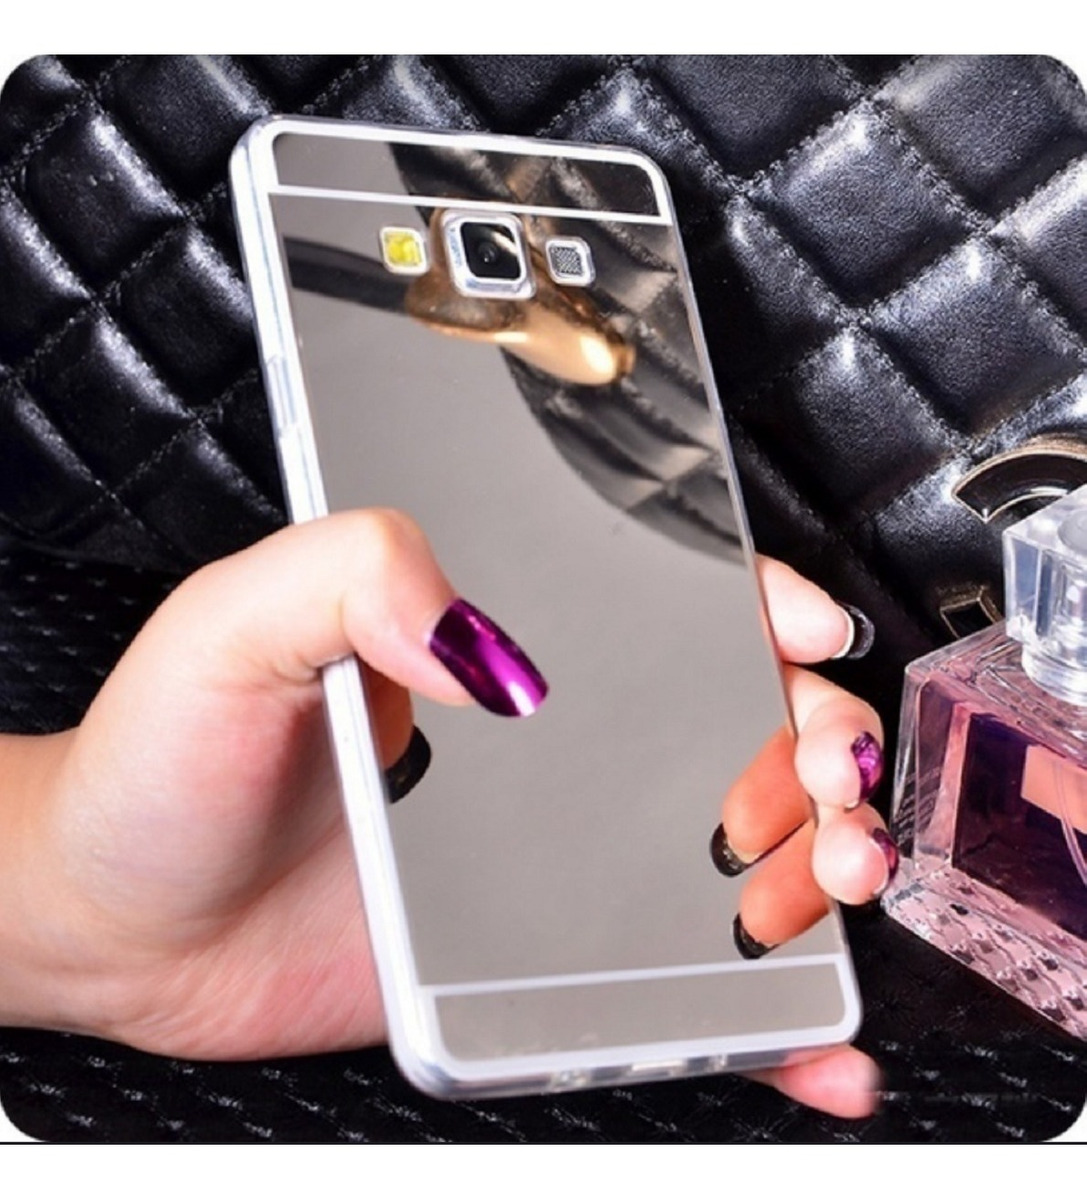 251848066ba Funda Espejada Samsung A5 A6 J1 J2 J3 J5 J7 Neo Prime S6 S7 - $ 148 ...